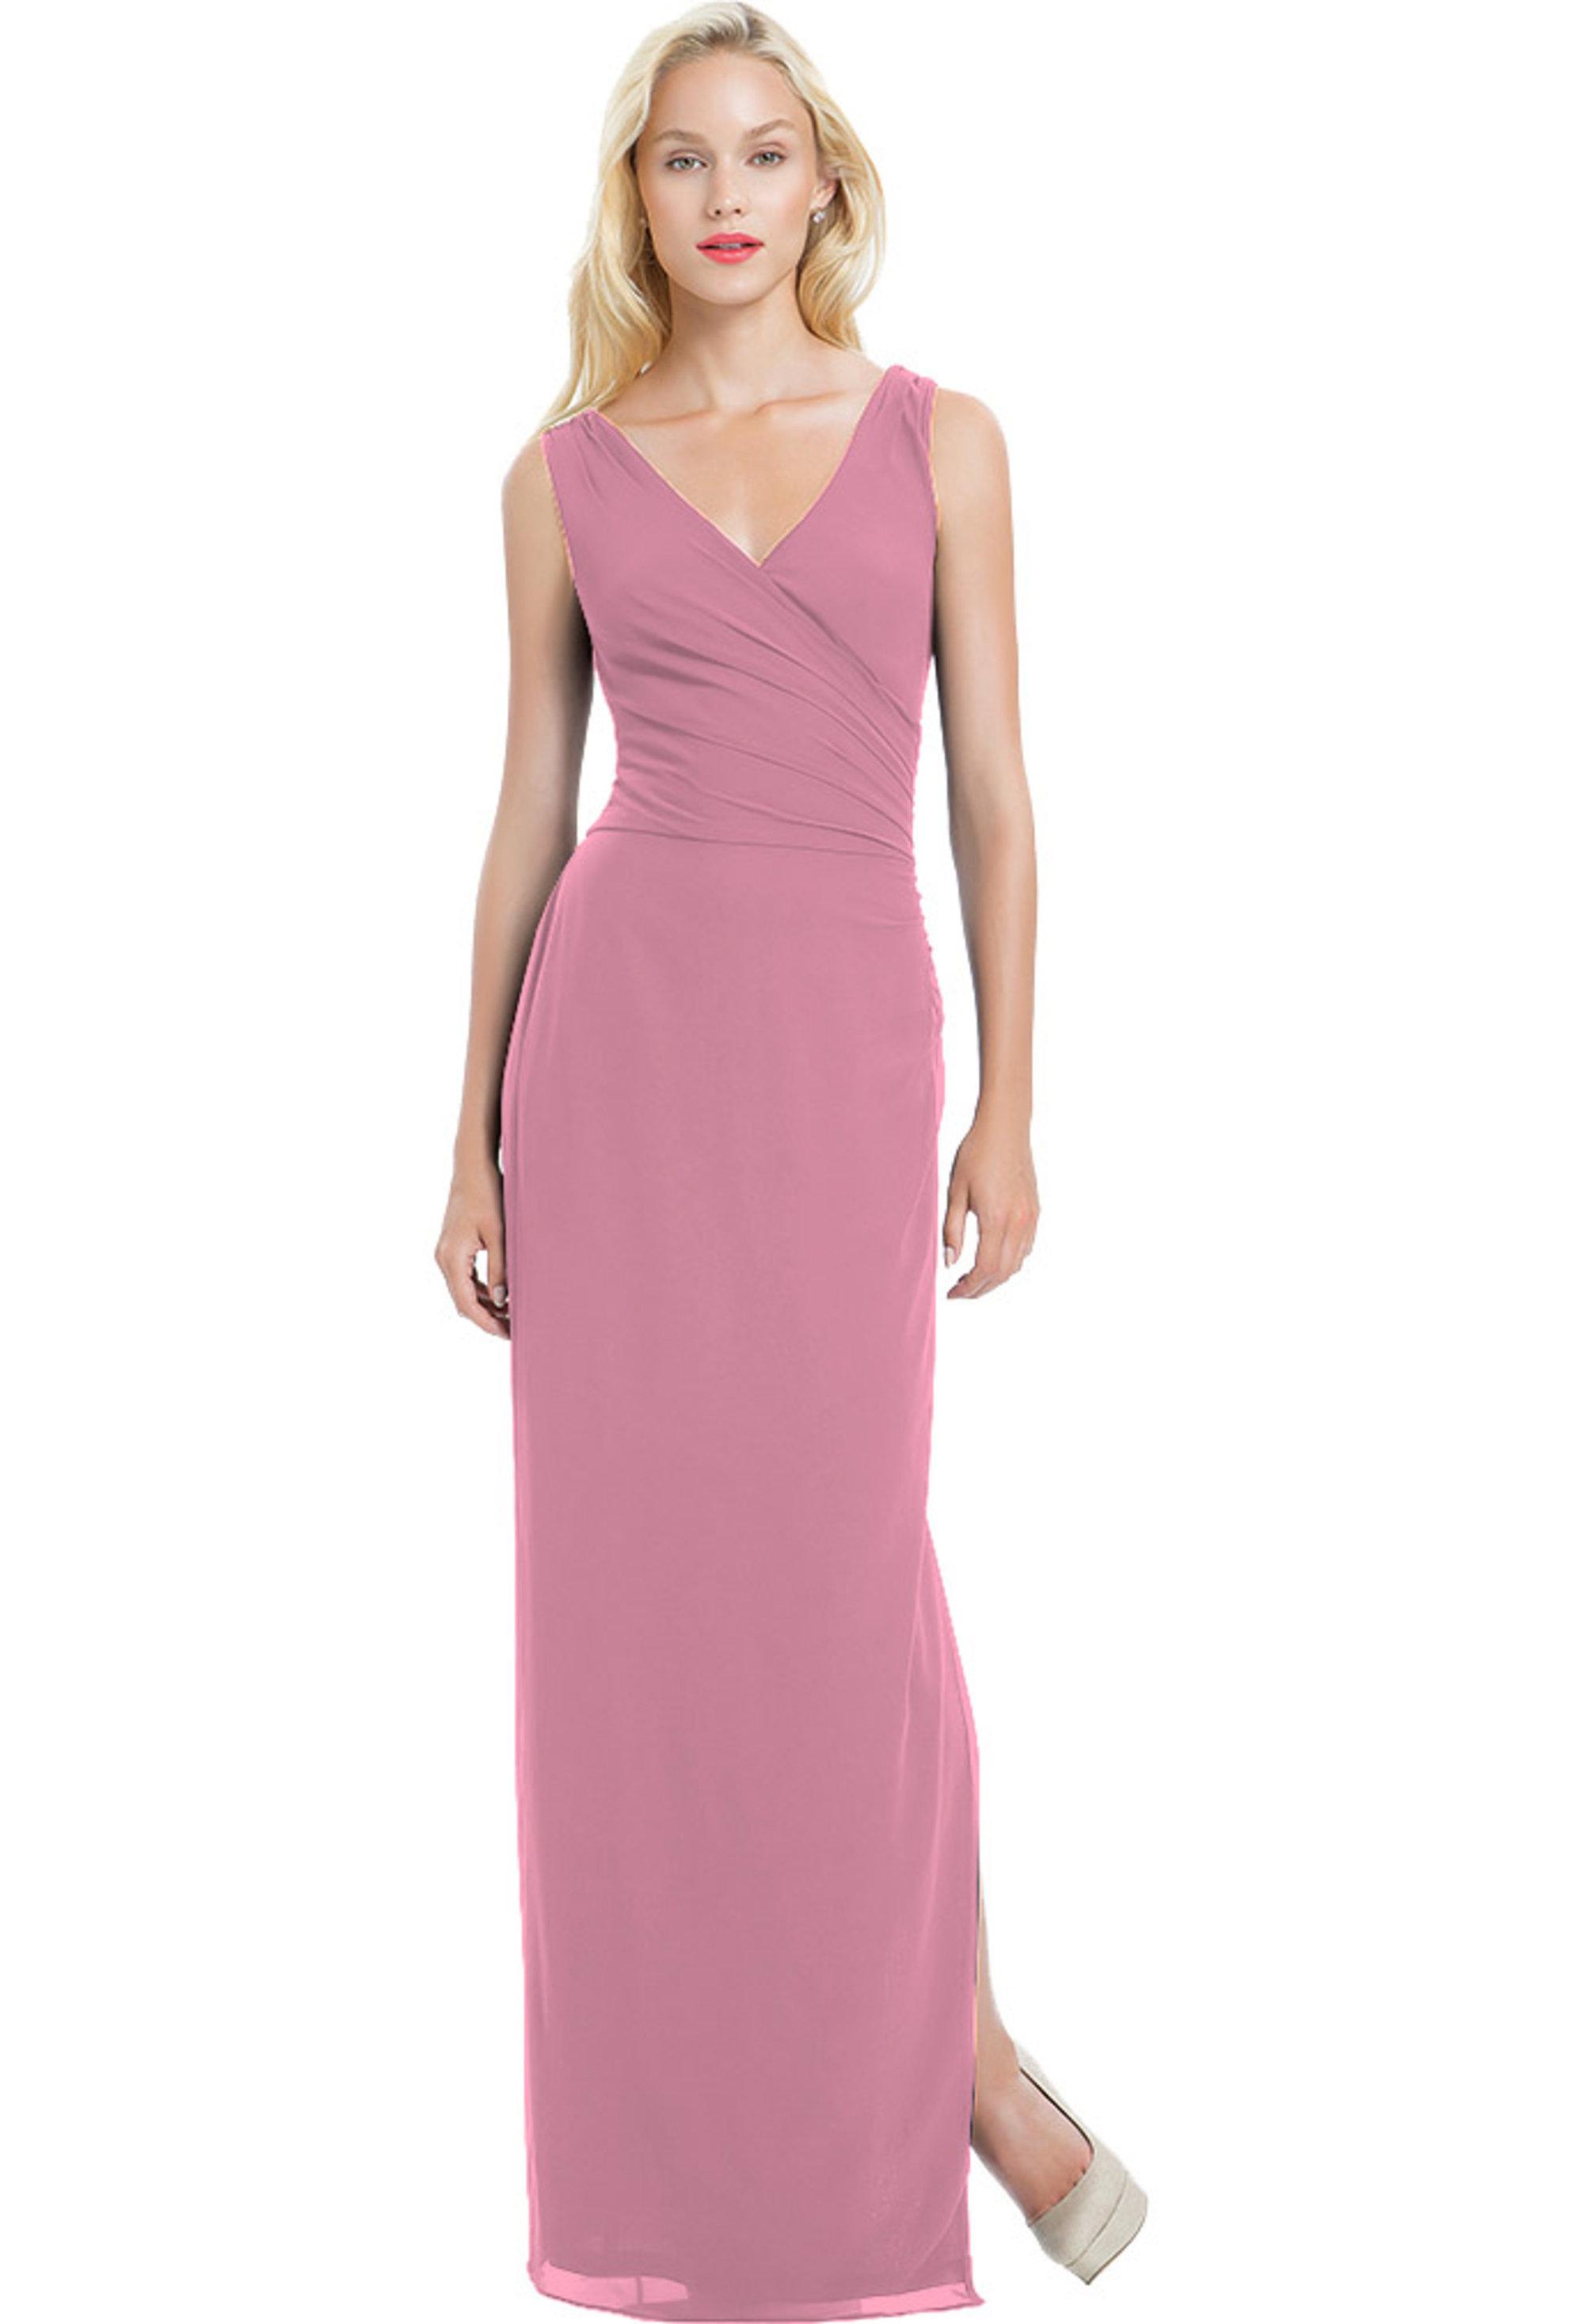 Bill Levkoff ROSEPETAL Chiffon Sleeveless Side Slit gown, $190.00 Front